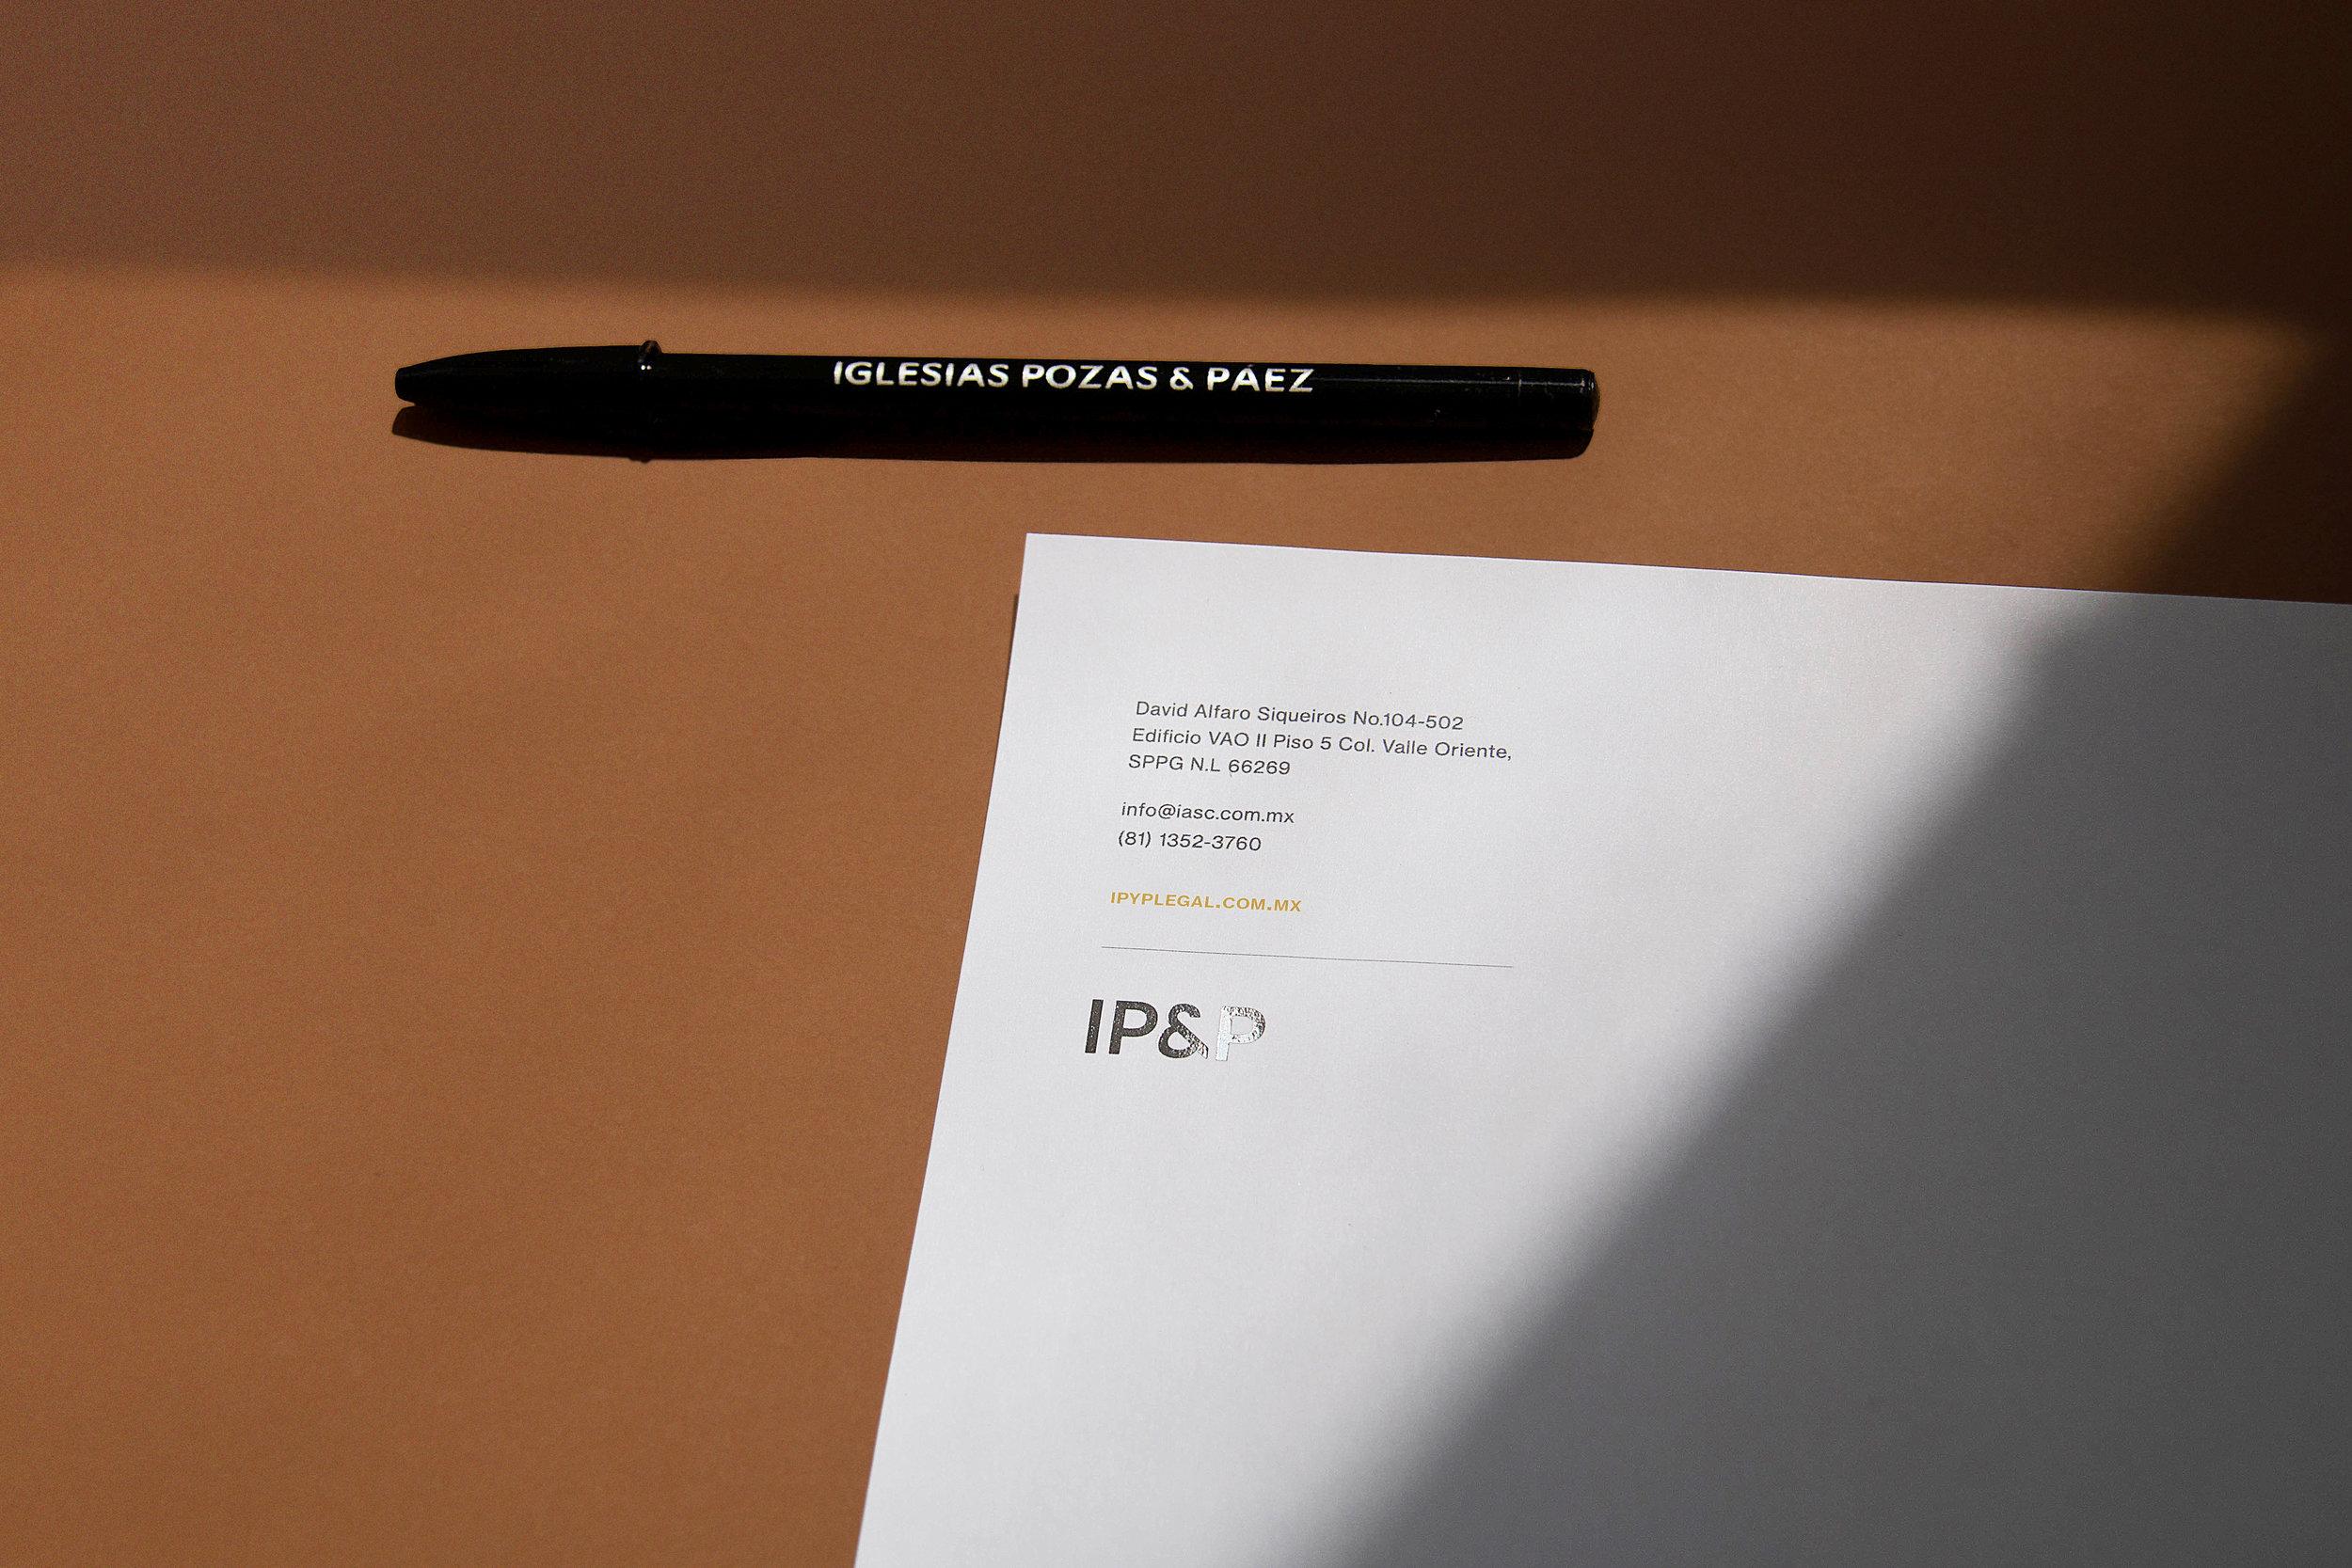 IPP-PORTAFOLIO (25 of 56).jpg